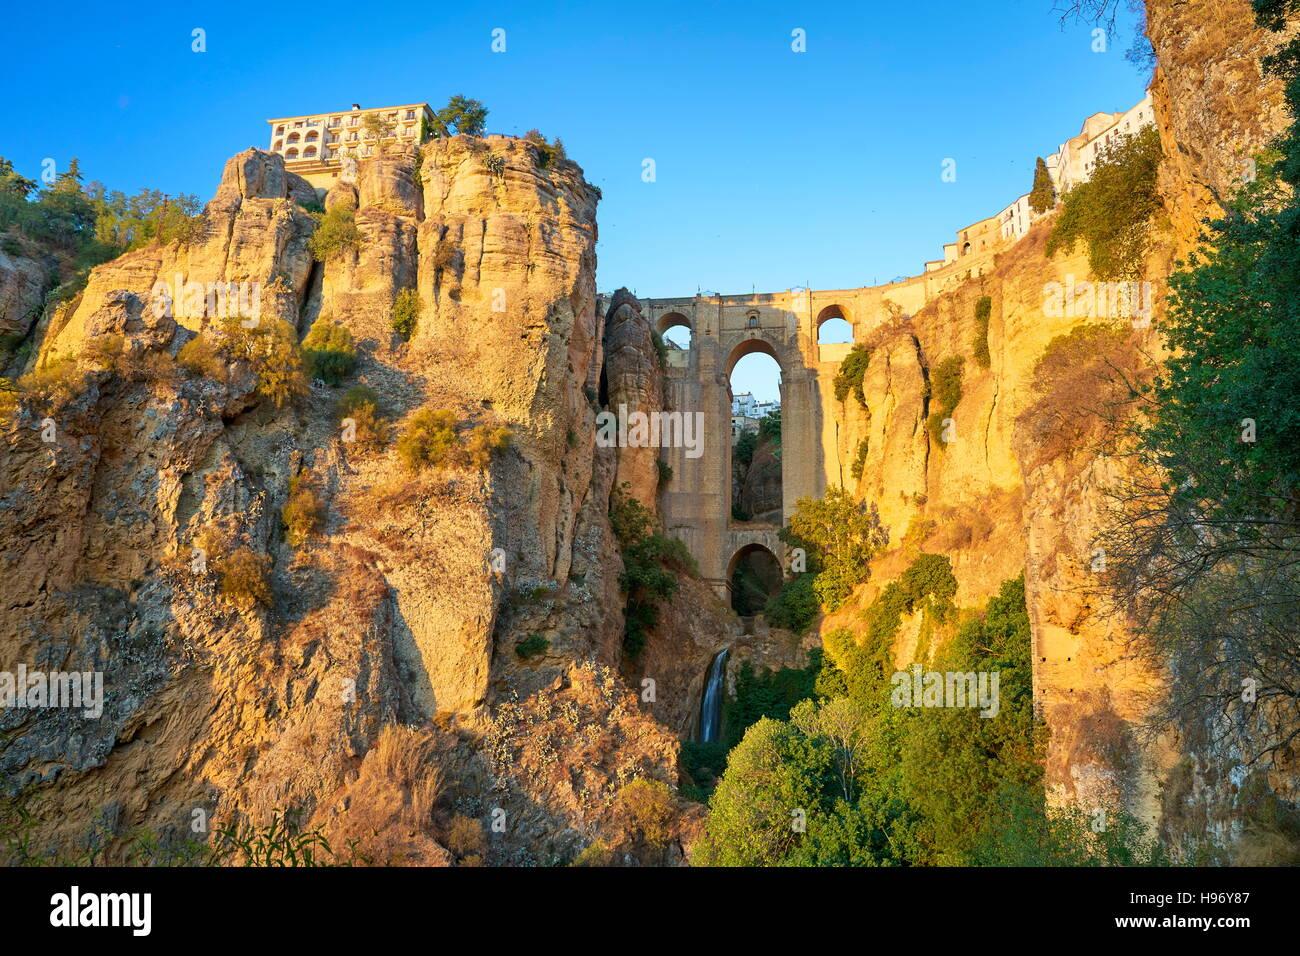 Ronda - Puente Nuevo Bridge, Andalusia, Spain - Stock Image